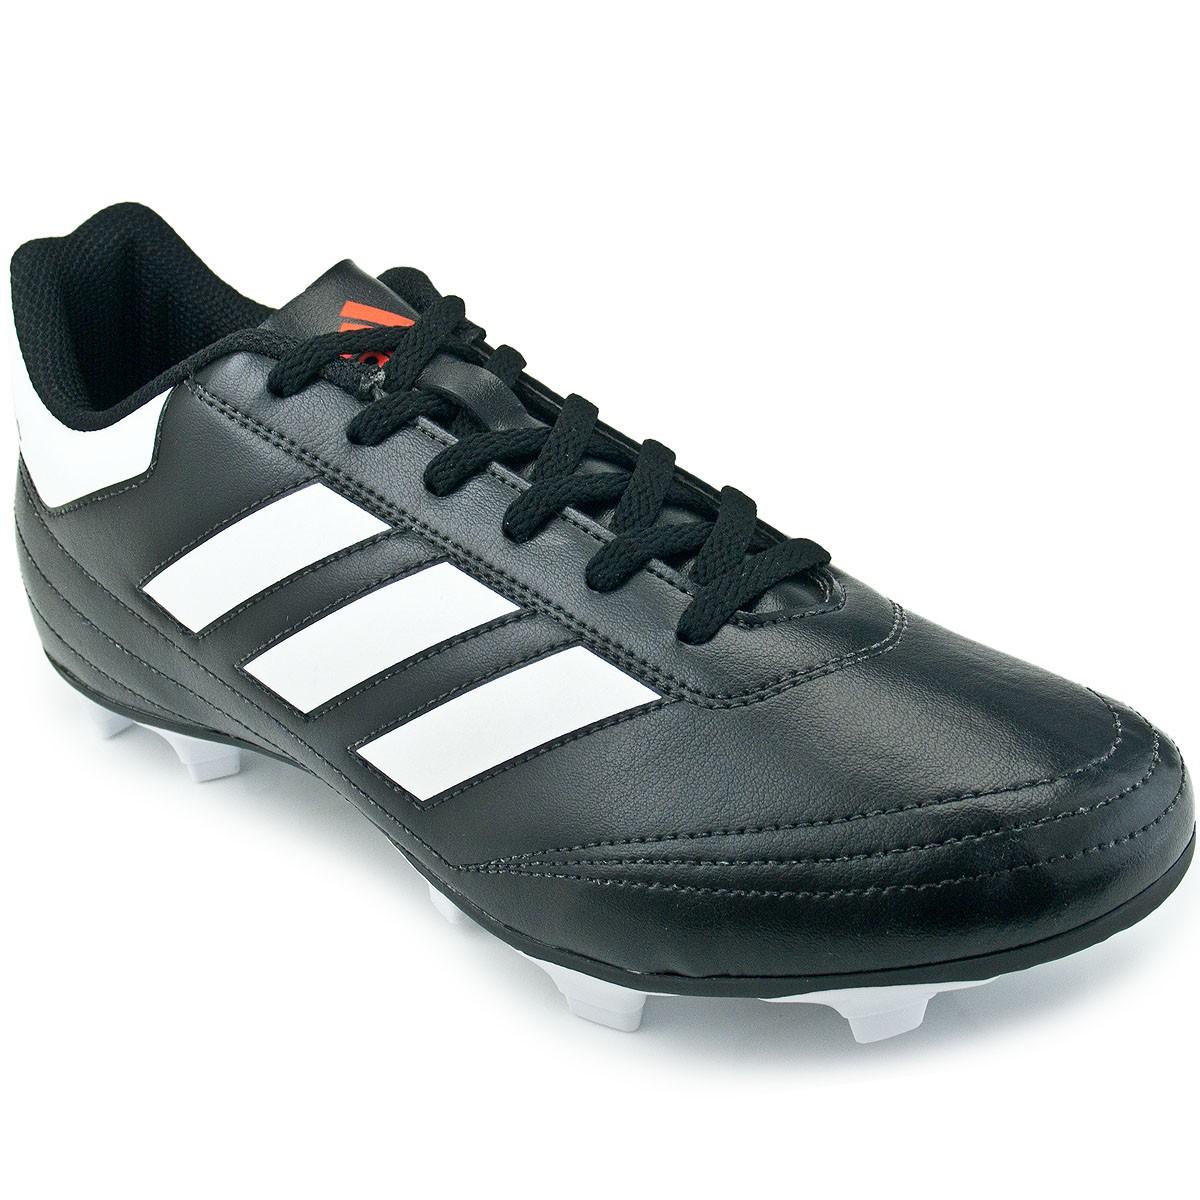 b77cd8e226 Chuteira Adidas Goletto 6 FG